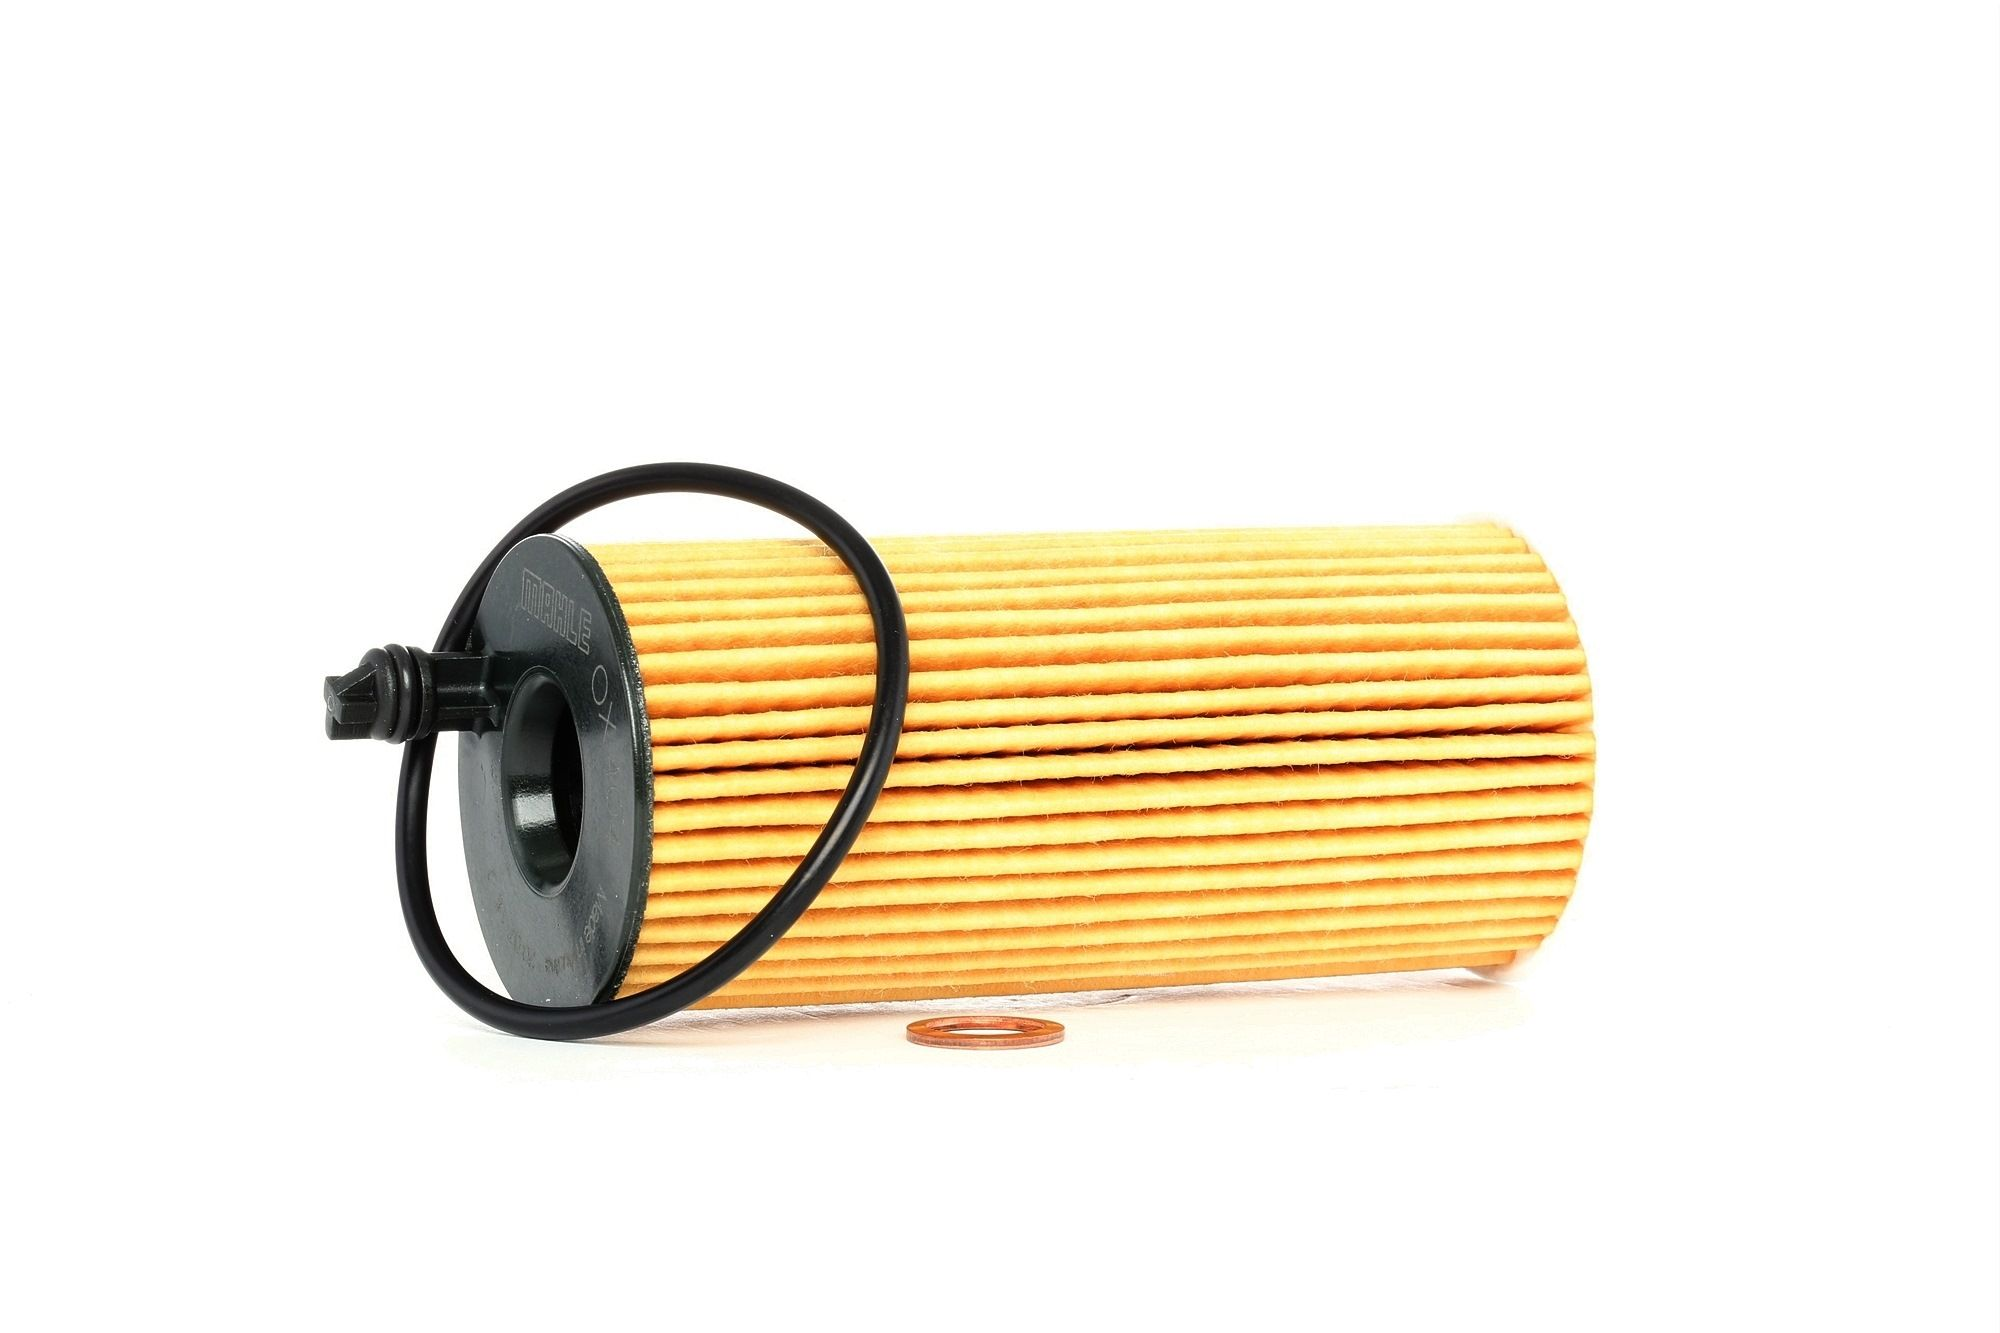 00OX404DECO KNECHT Filtereinsatz Innendurchmesser 2: 18,55mm, Ø: 53,0mm, Höhe: 133,6mm, Höhe 1: 116,1mm Ölfilter OX 404D günstig kaufen